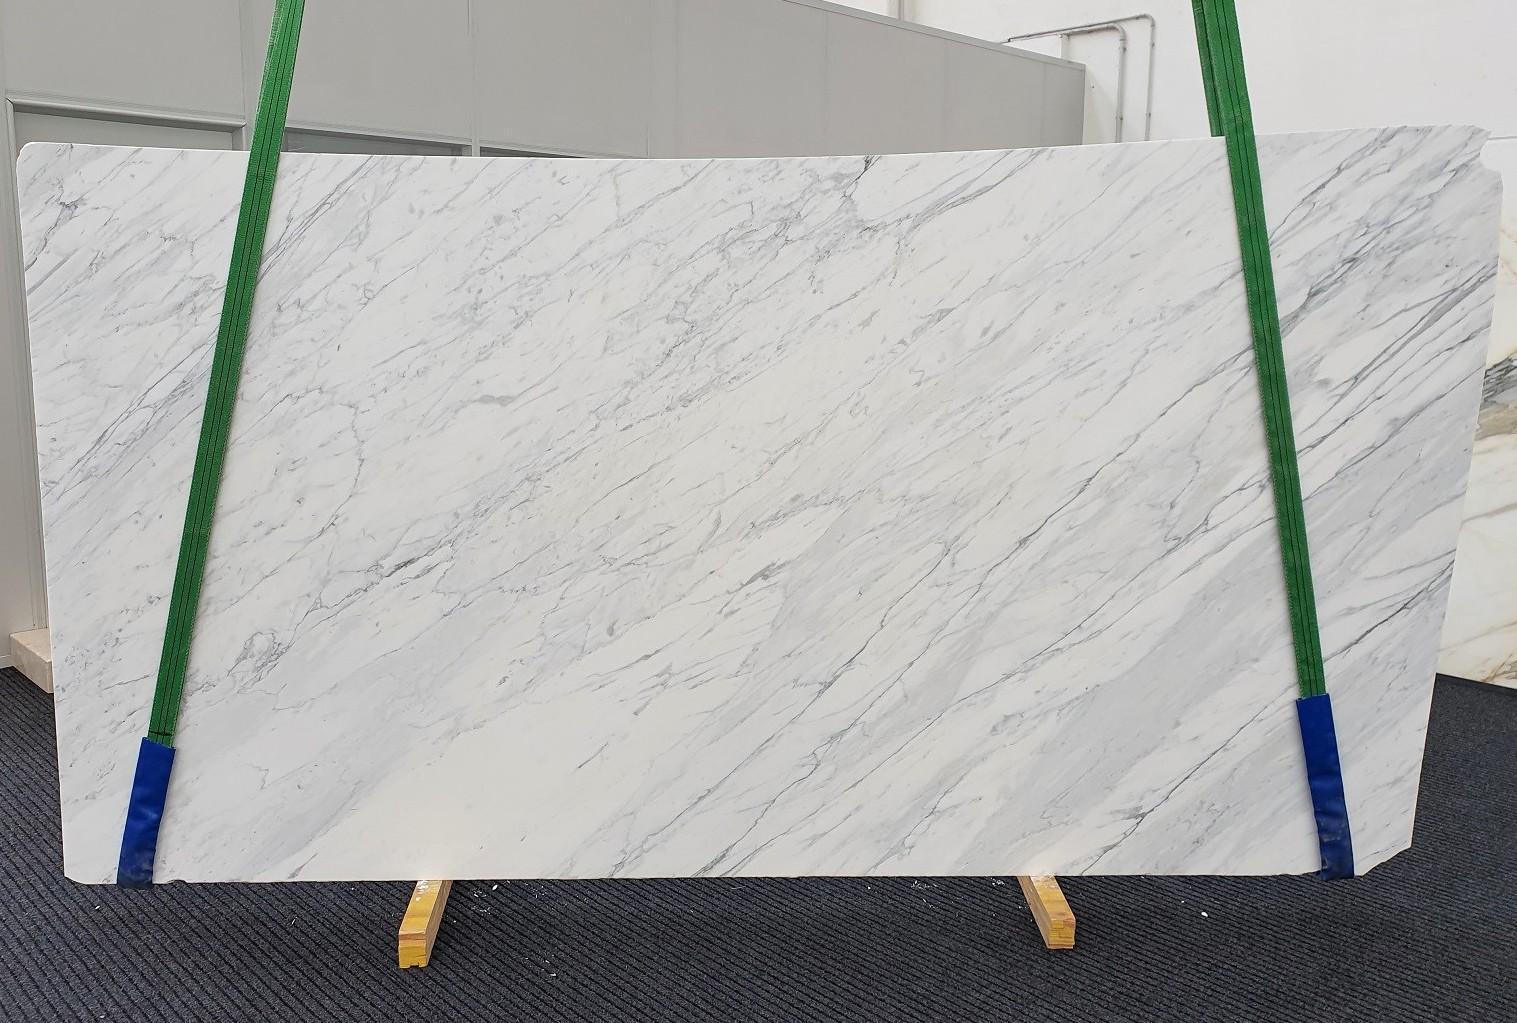 CALACATTA CARRARA Supply Veneto (Italy) honed slabs 1313 , Slab #19 natural marble